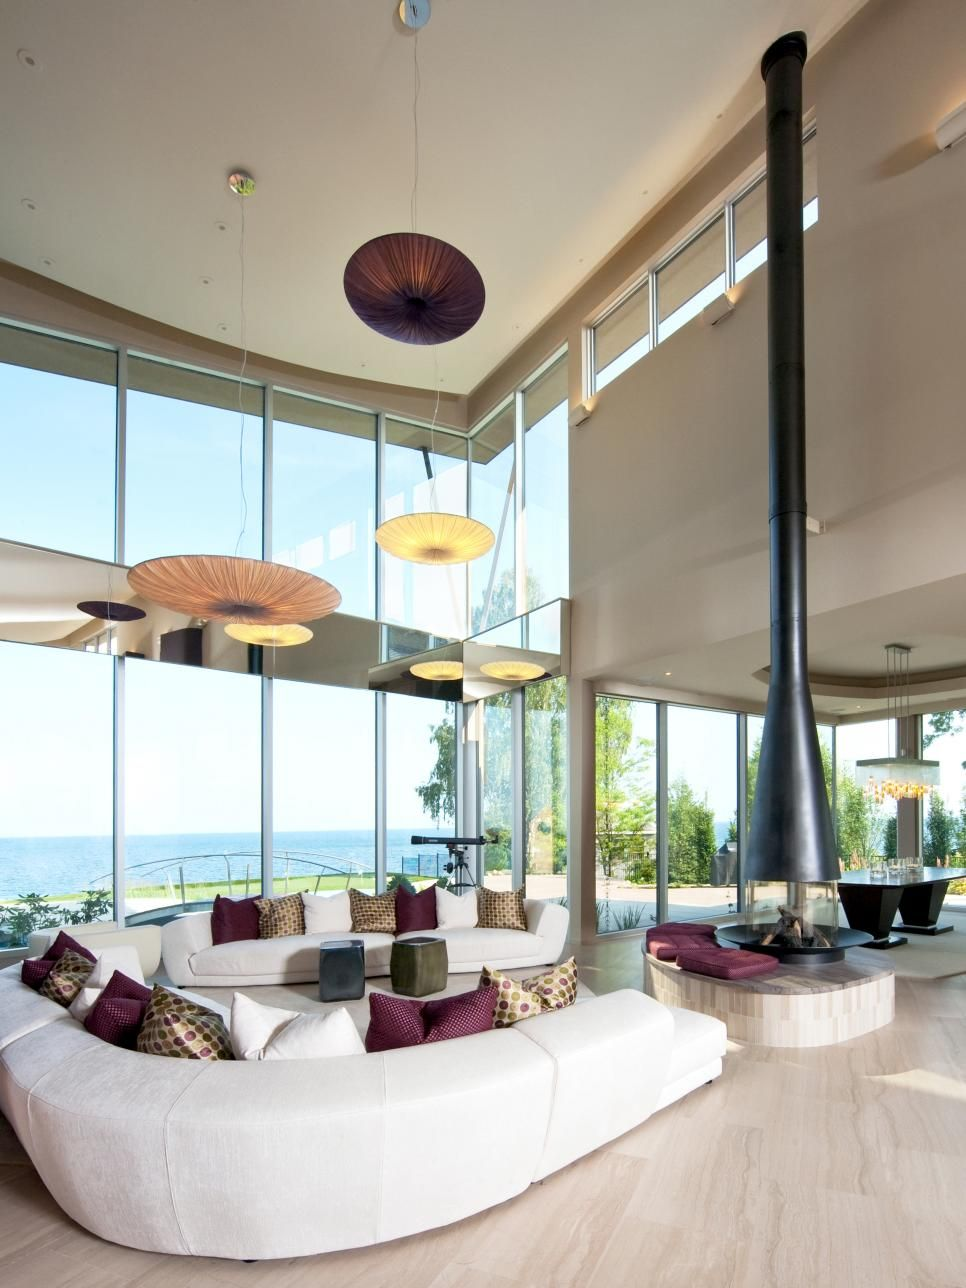 17 Hot Fireplace Designs Living Room Design Modern Interior Design Living Room Best Living Room Design